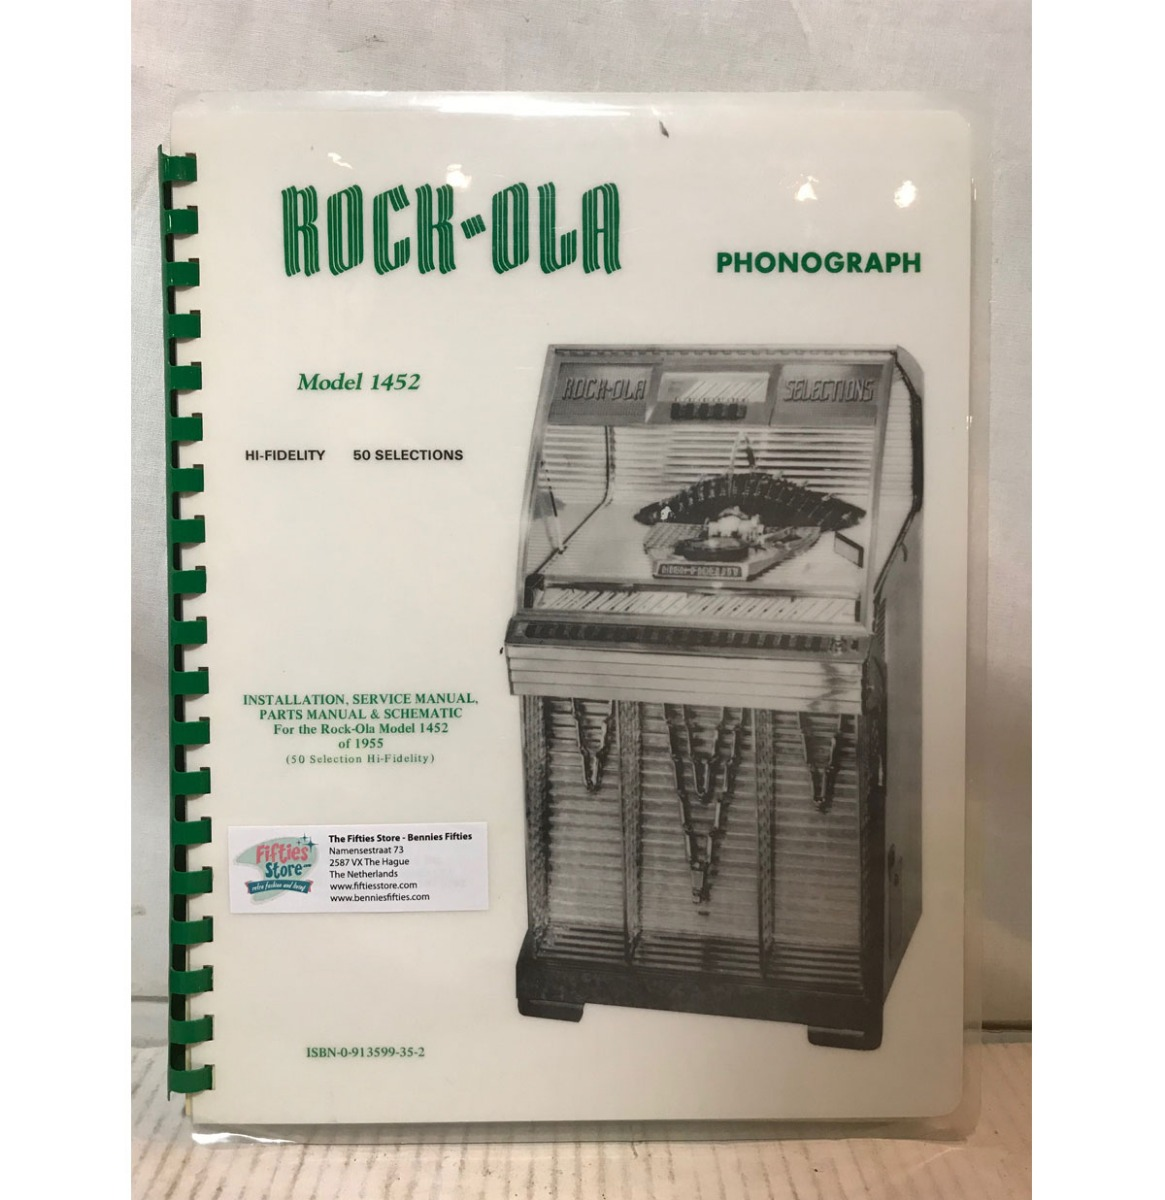 Rock-Ola 1452 Jukebox Service Manual